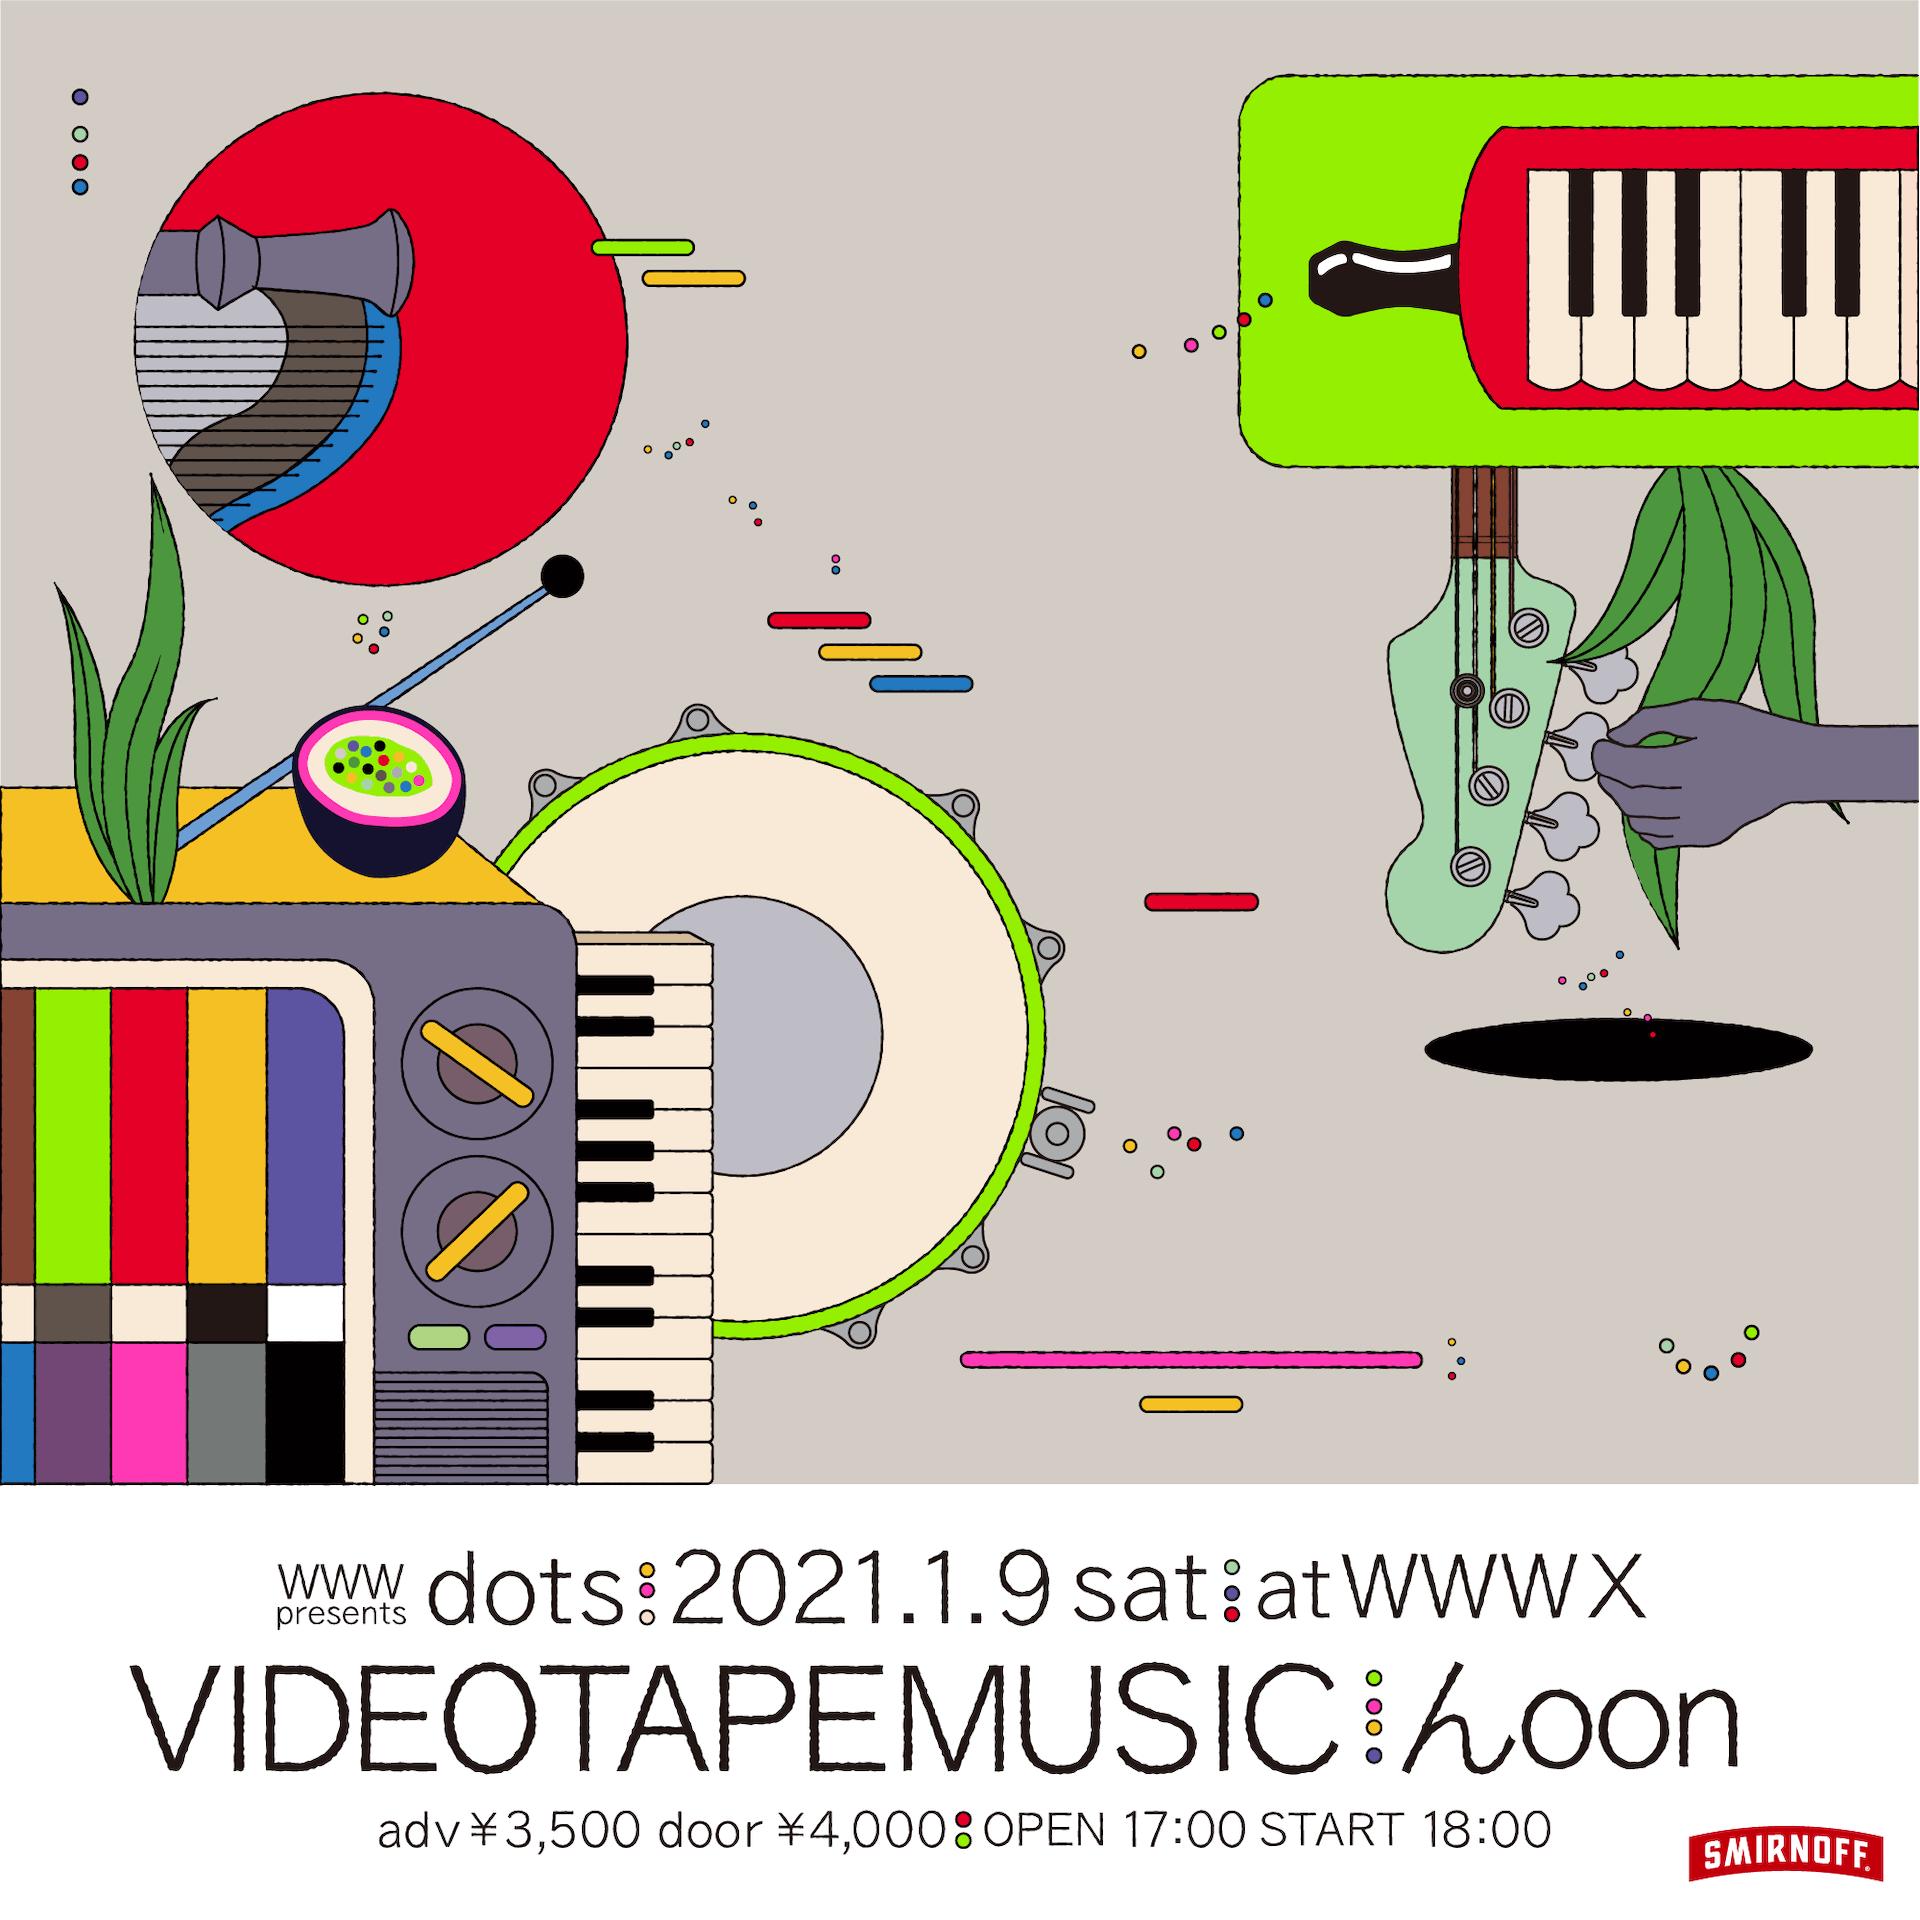 VIDEOTAPEMUSIC&んoonが初の2マンライブをWWW Xにて有観客で開催決定! music201210_VIDEOTAPEMUSIC_noon_wwwx_1